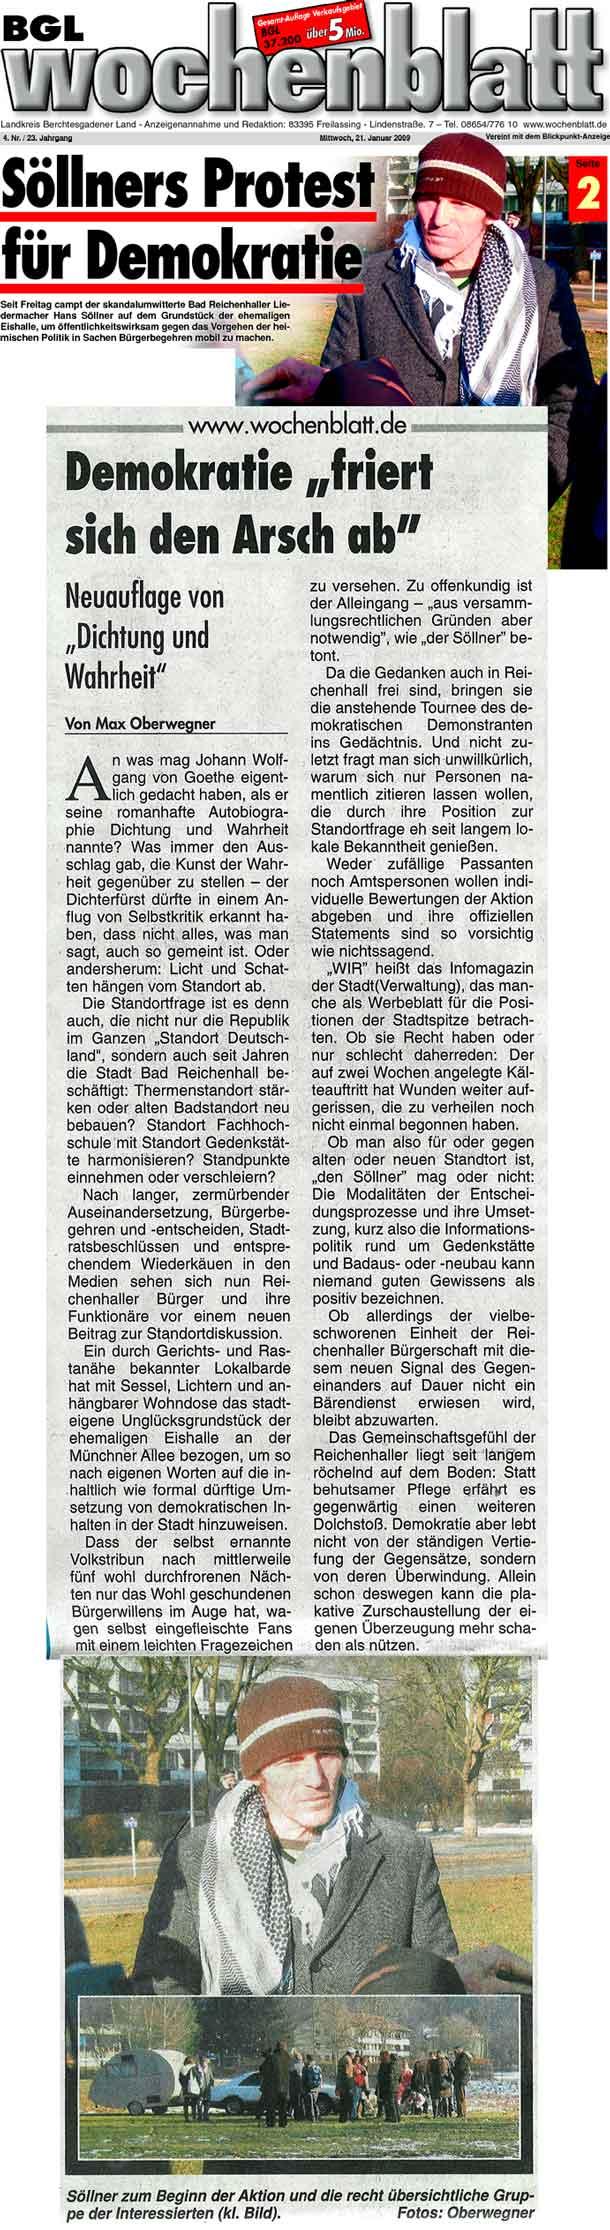 wochenblatt-21.1.09web